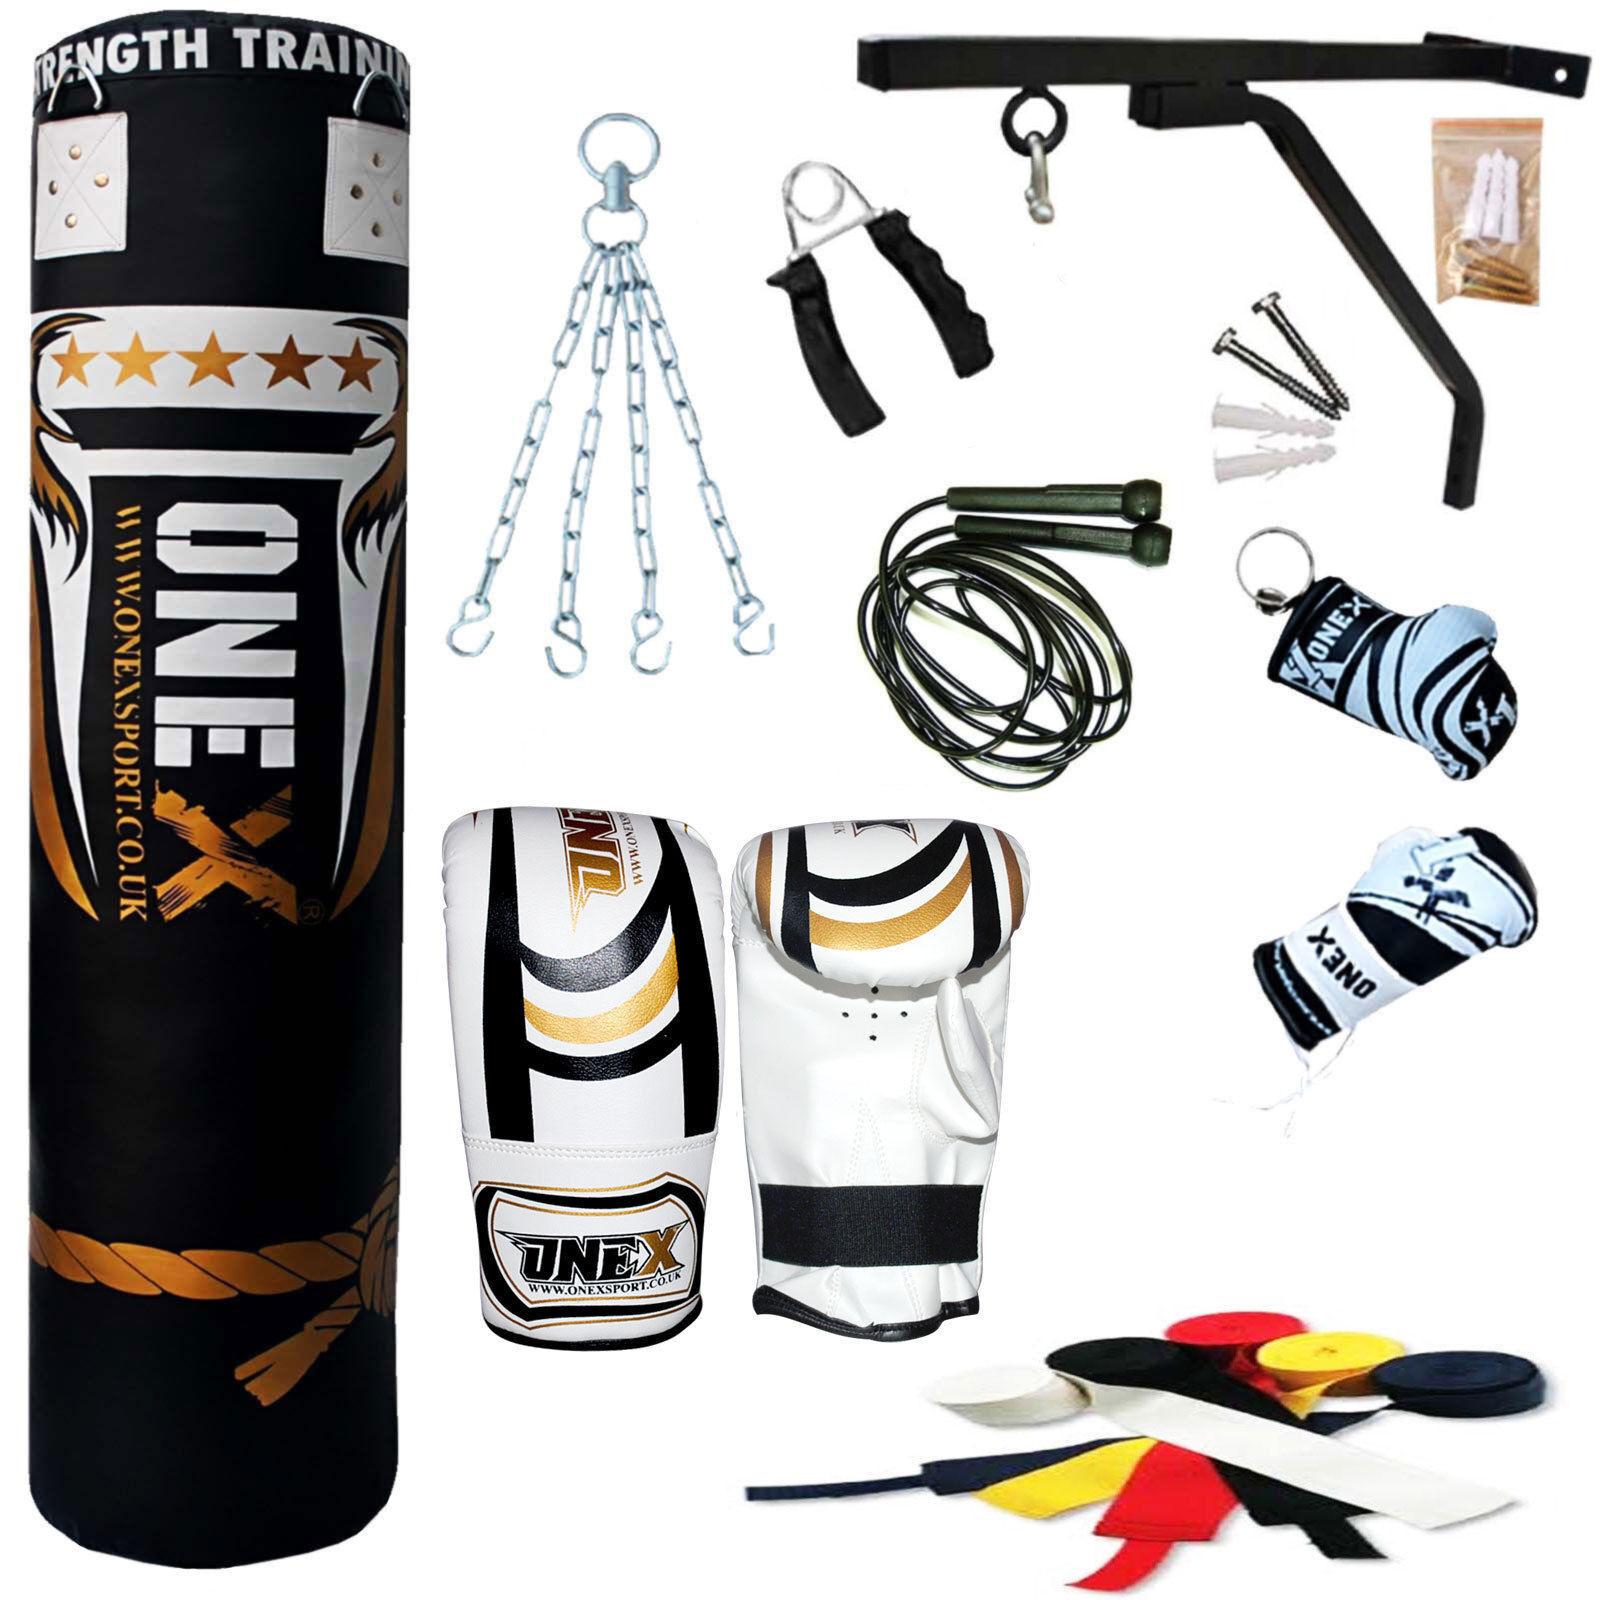 5ft Filled Hanging Boxing Punch Bag Set Punching Heavy MMA Free Standing Punching Set 7a2e1b